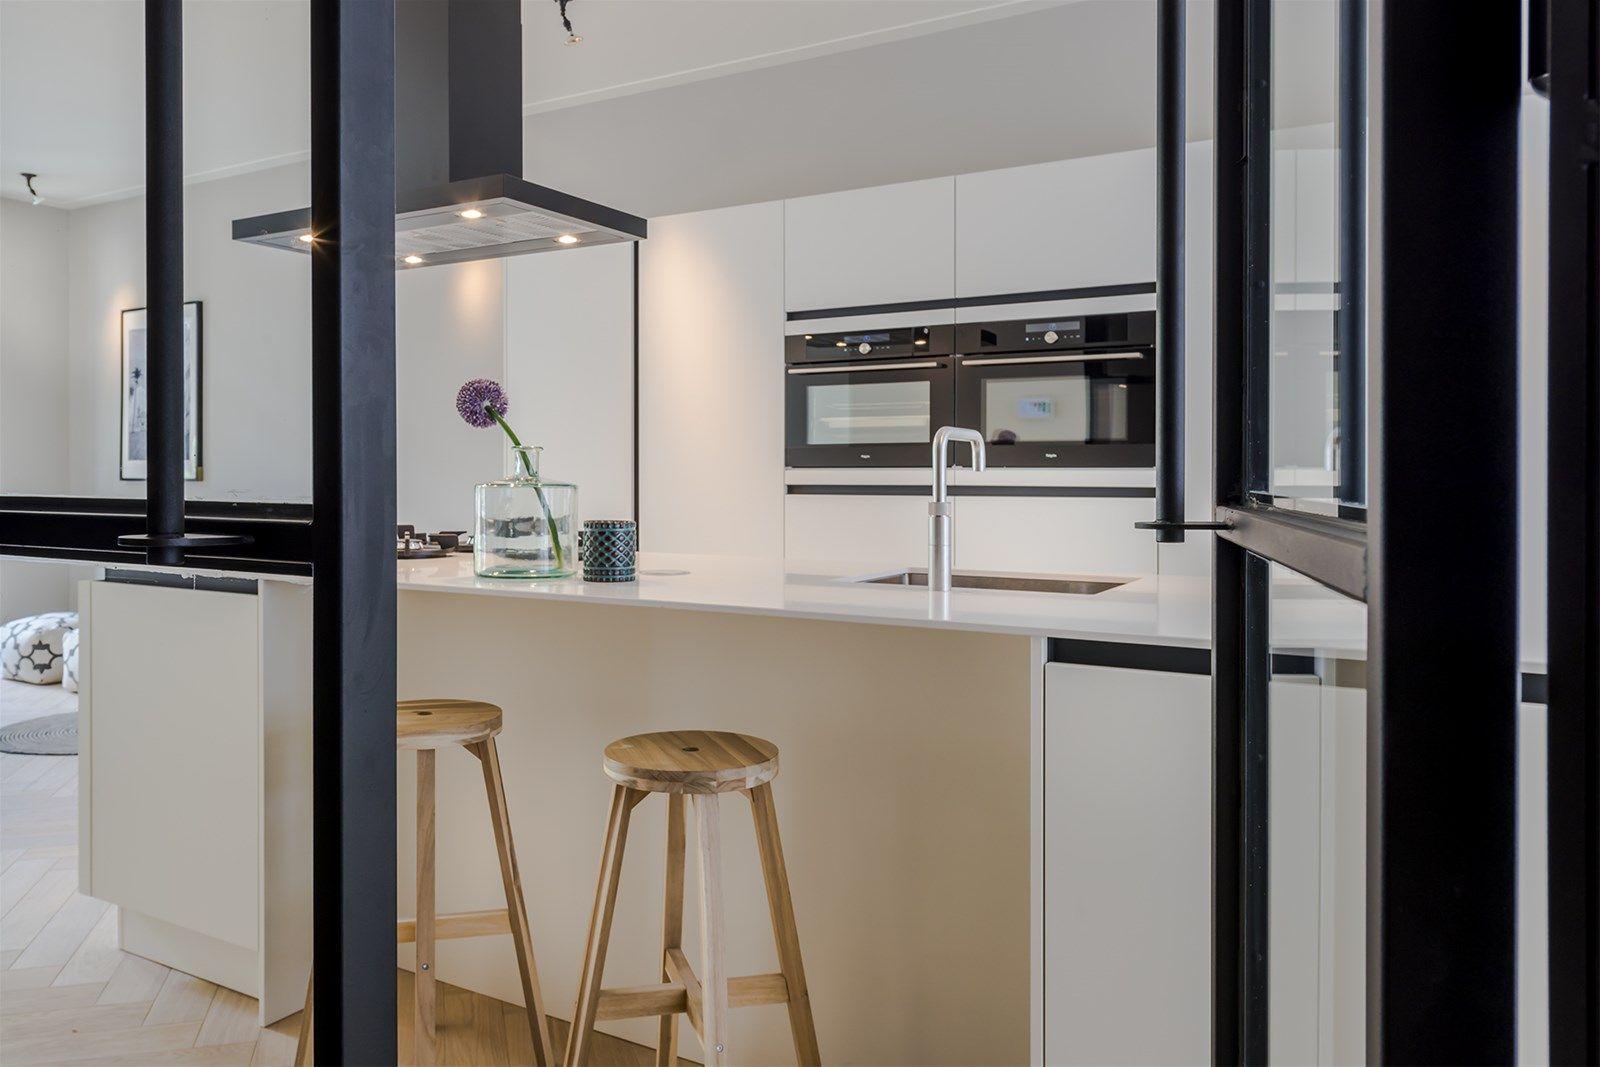 Turnkey Benedenwoning Souterrain : Turnkey benedenwoning met souterrain keuken